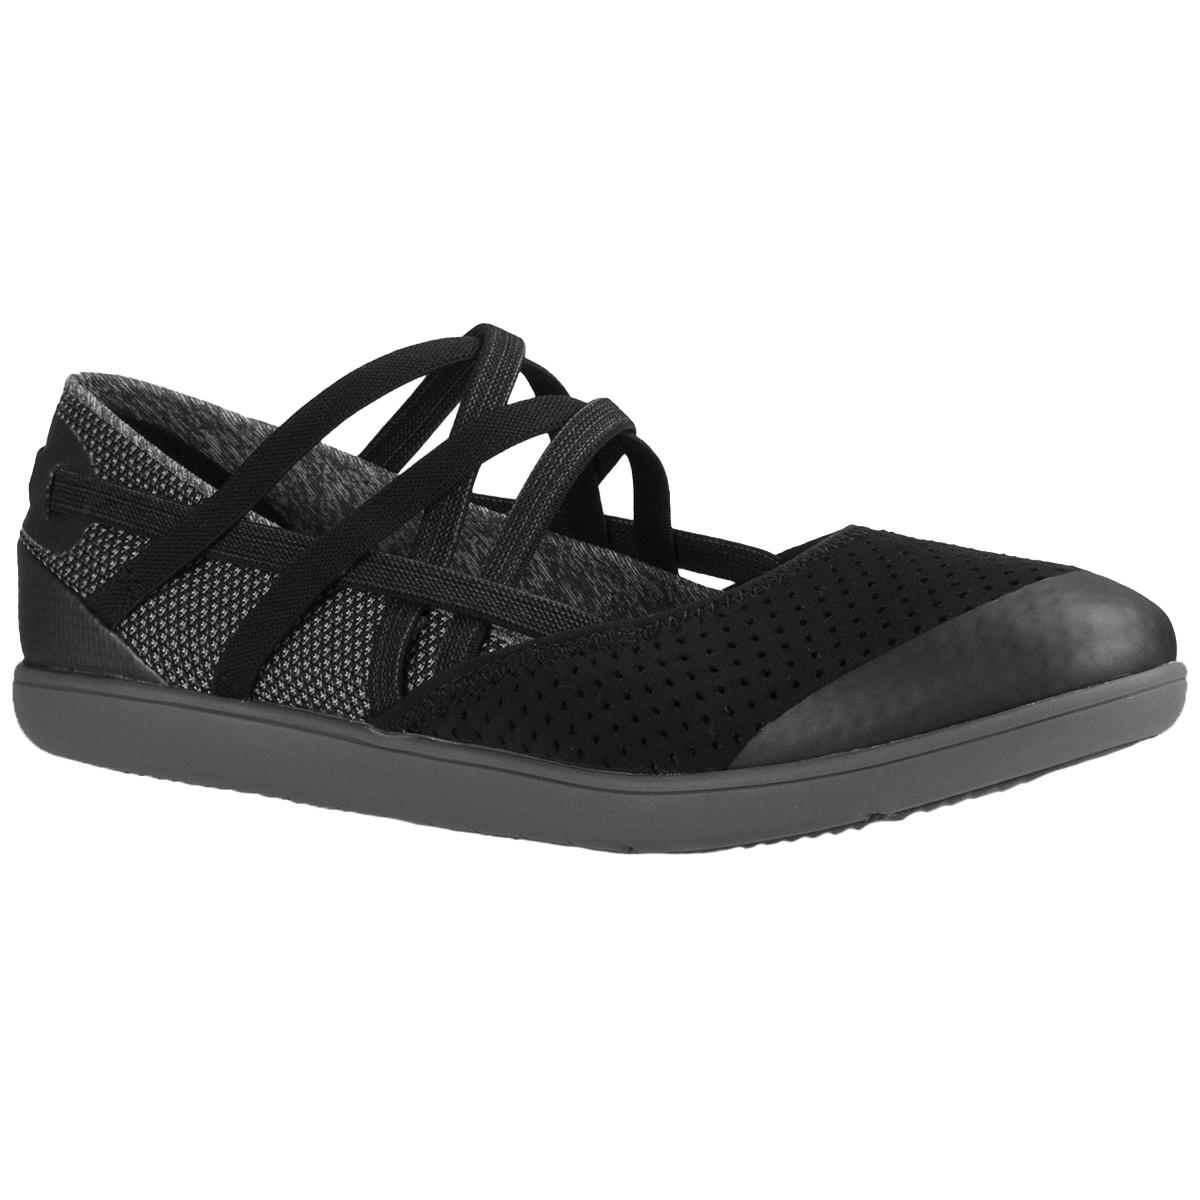 TEVA Women's Hydro-Life Slip-On Shoes